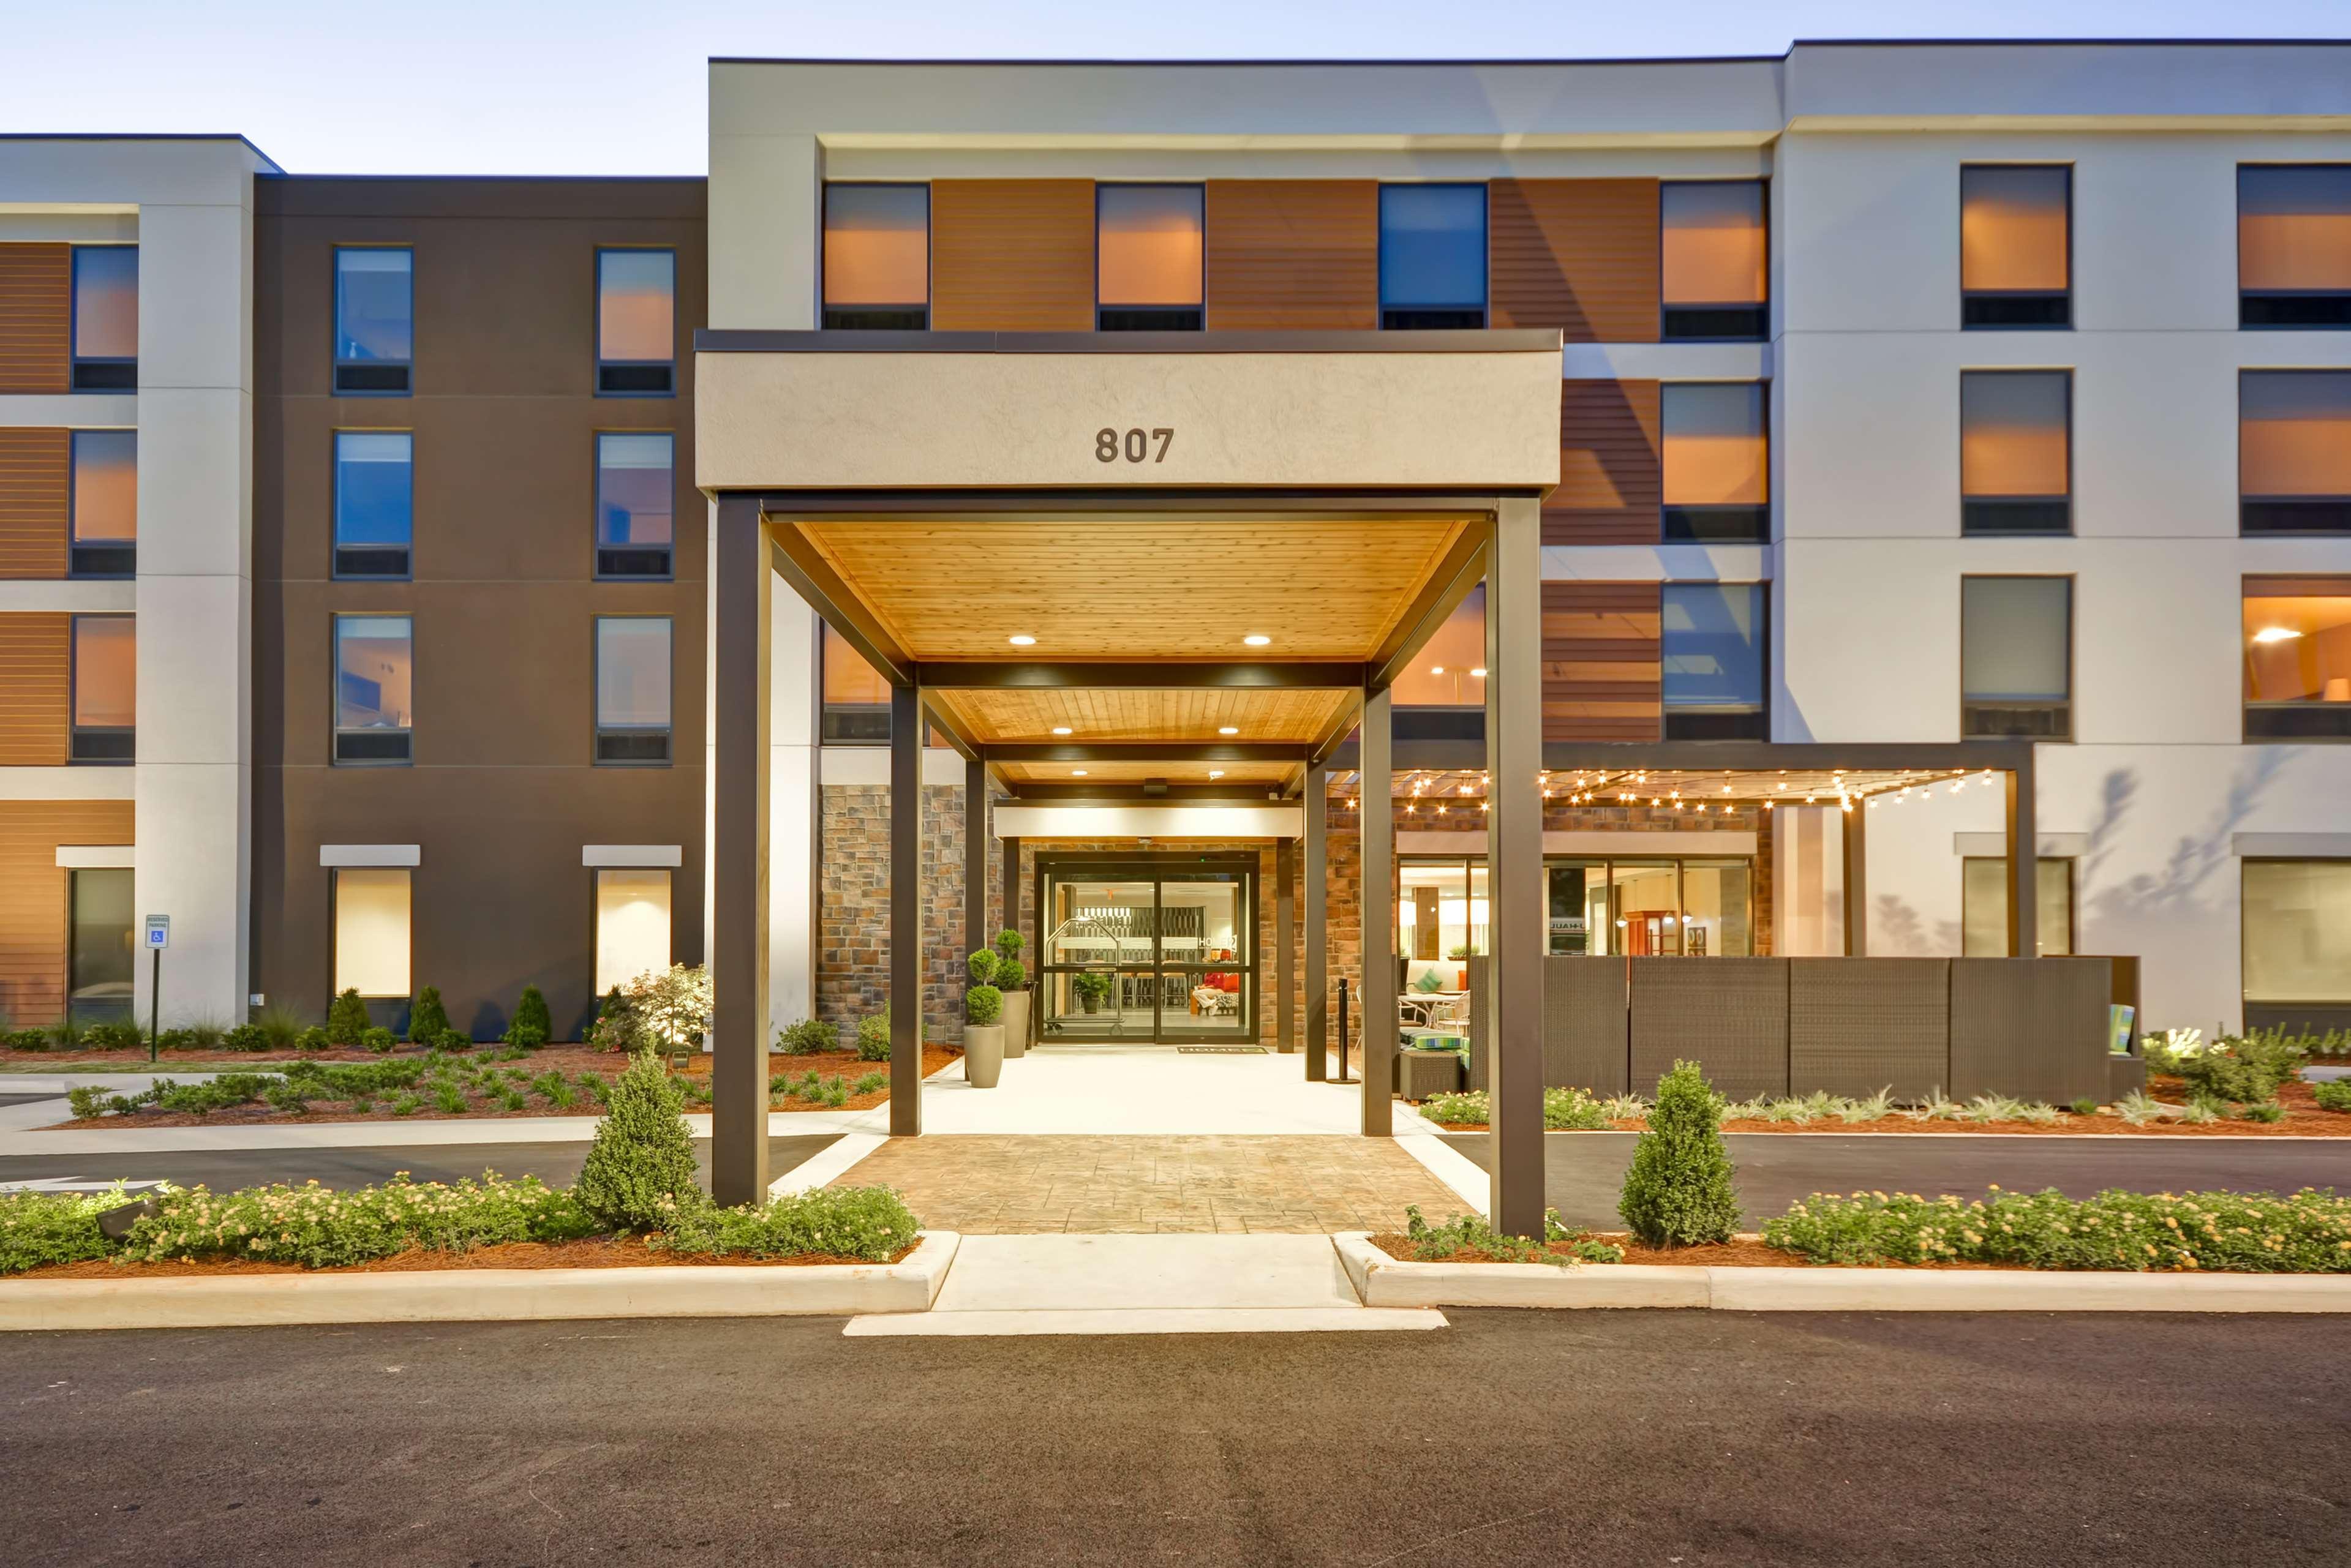 Home2 Suites Decatur, AL, Morgan